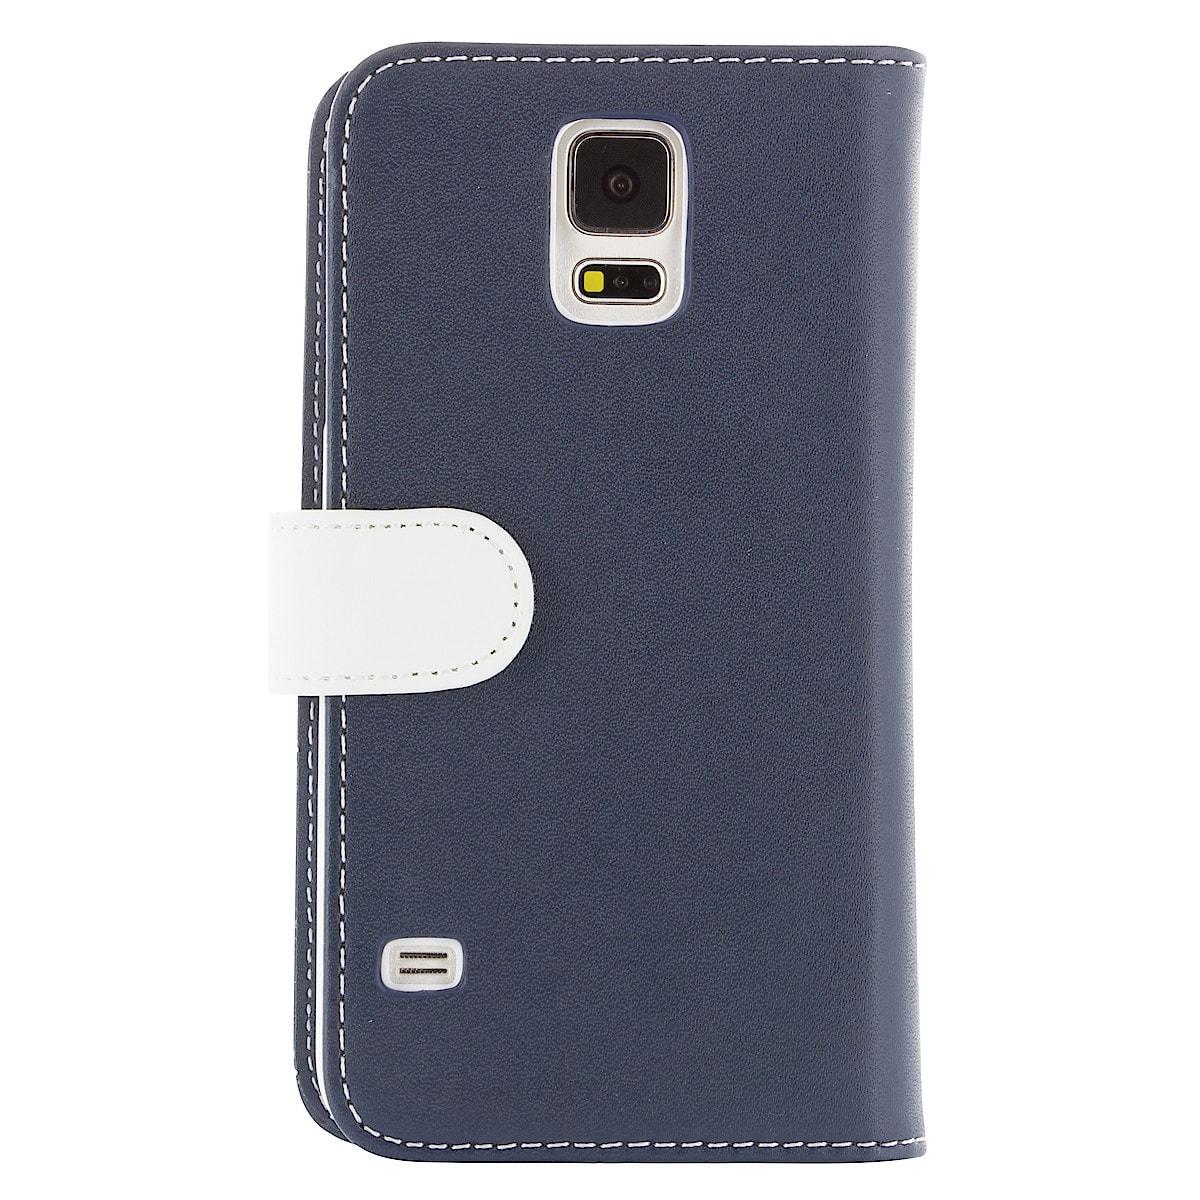 Lompakkokotelo XL Samsung Galaxy S4:lle, Holdit